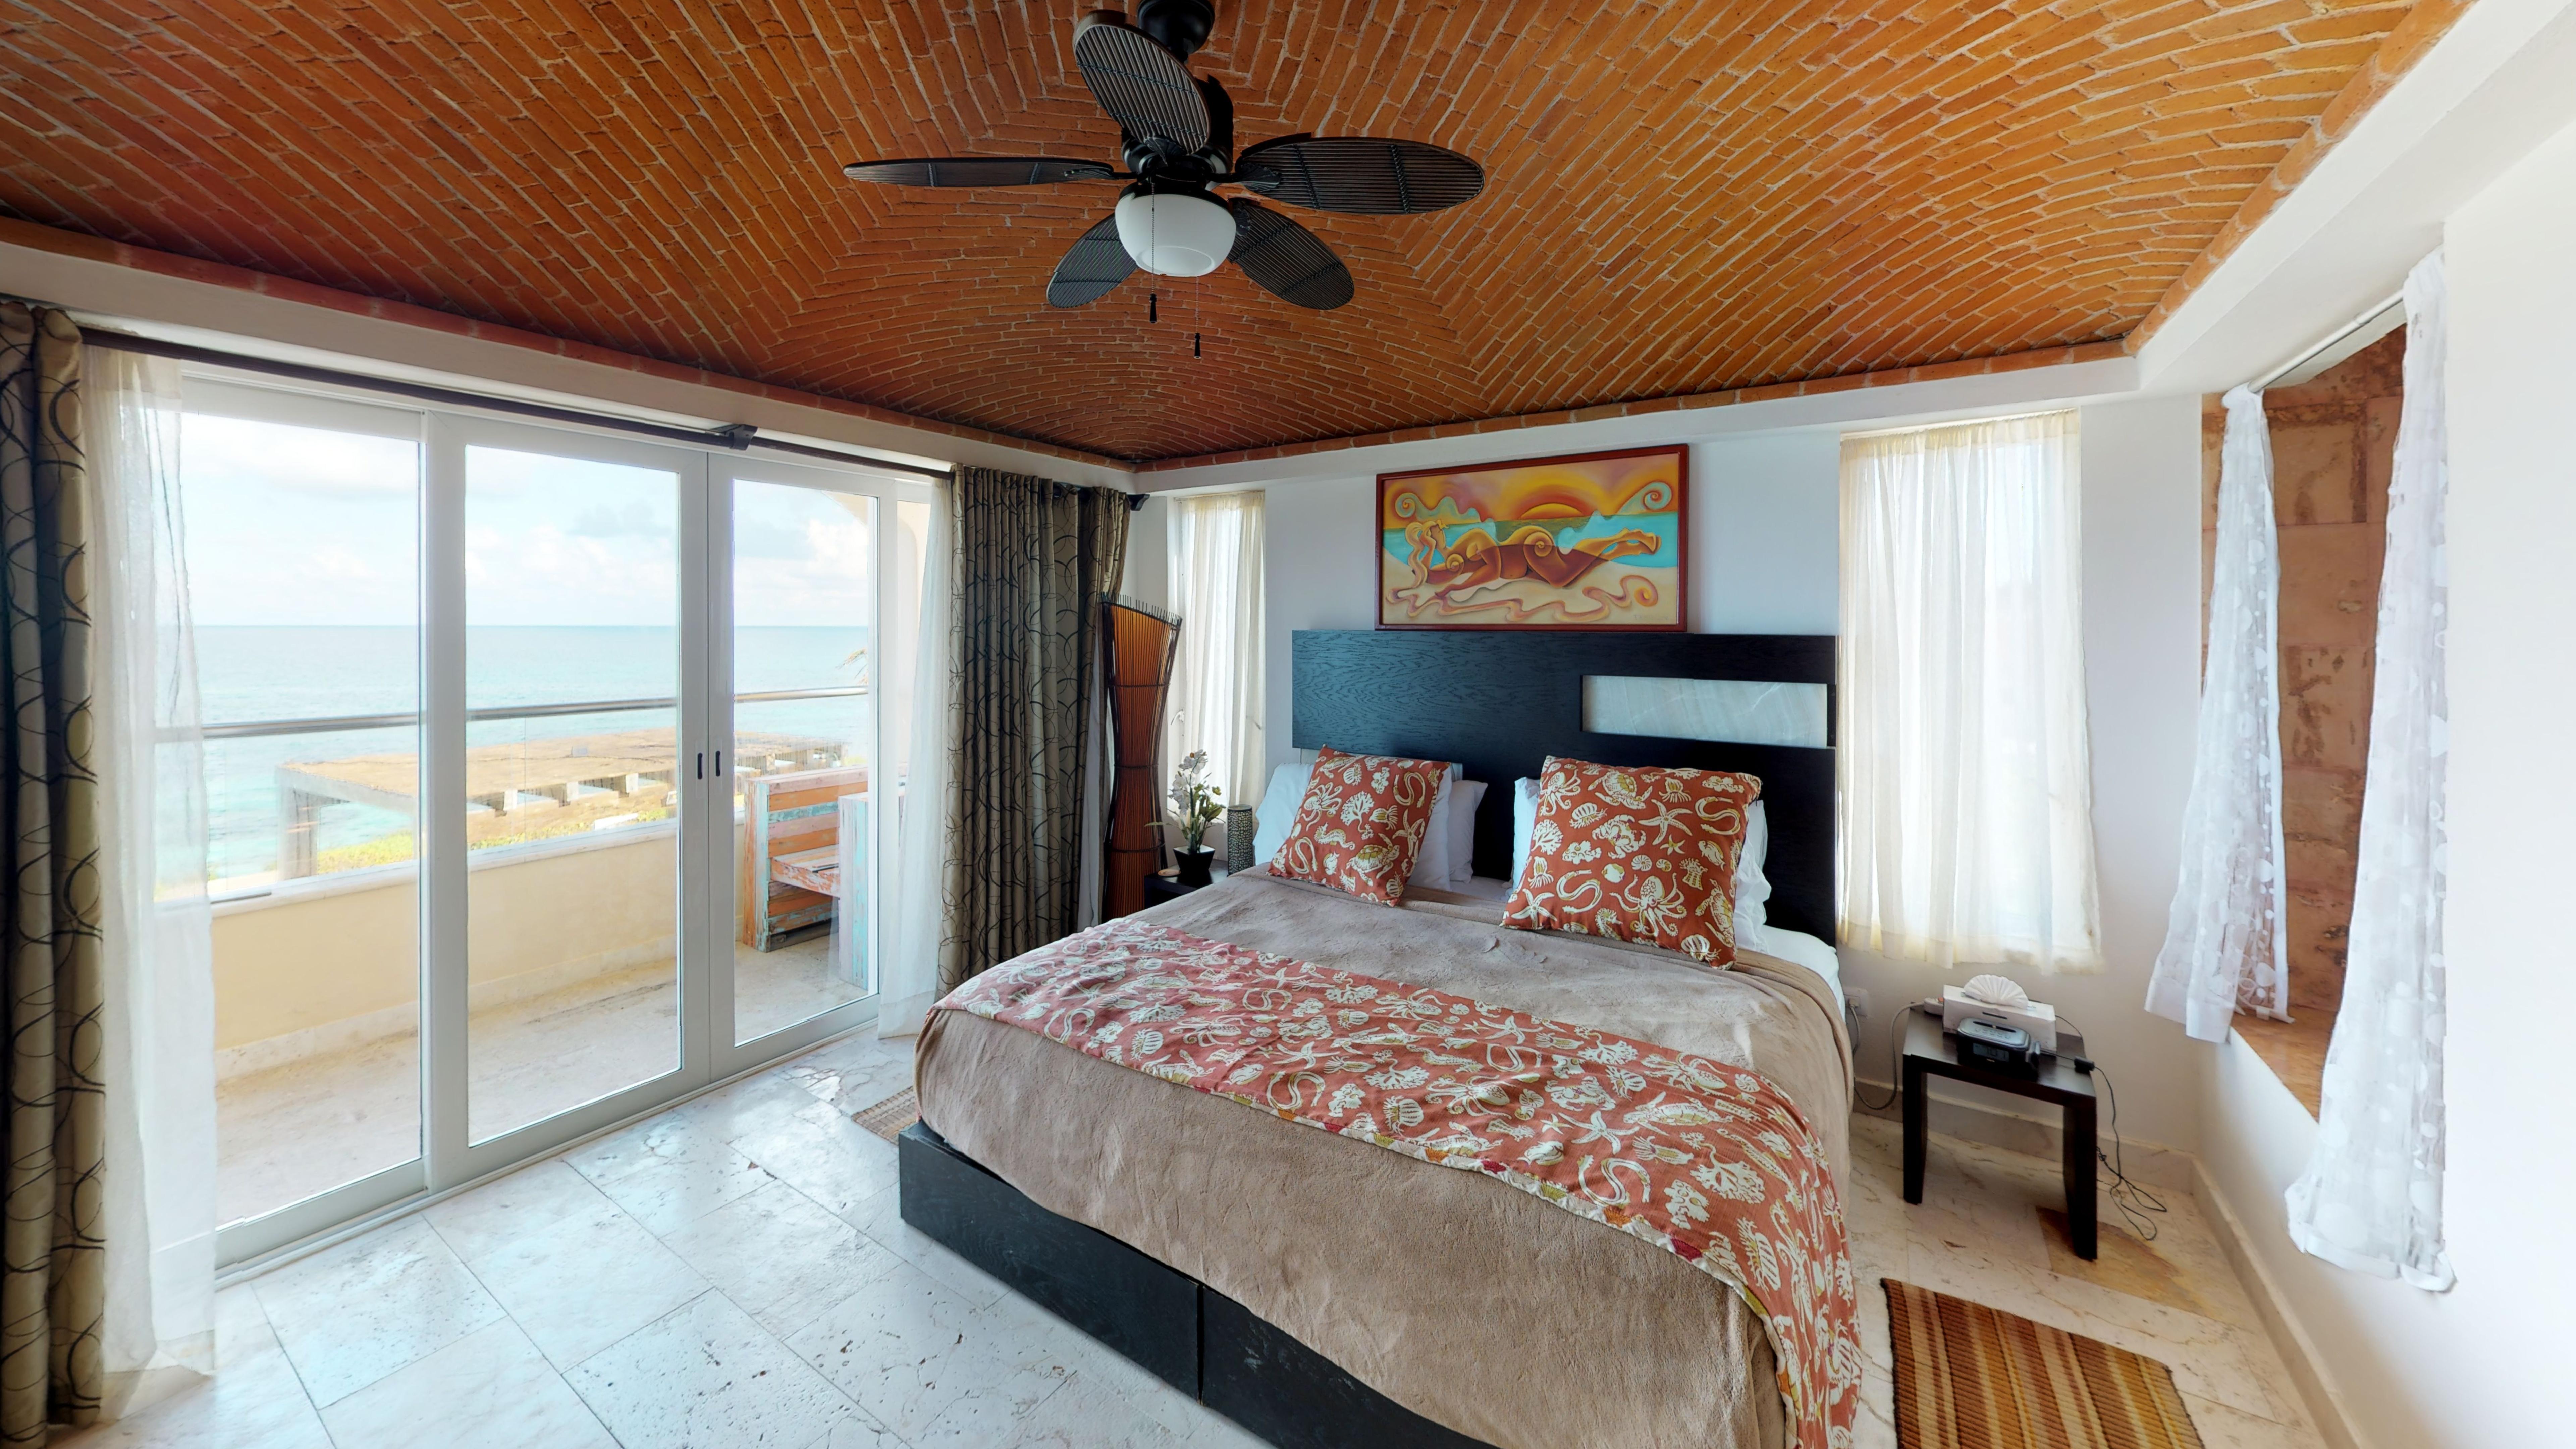 Isla-33-Apartament-1201-Bedroom.jpg